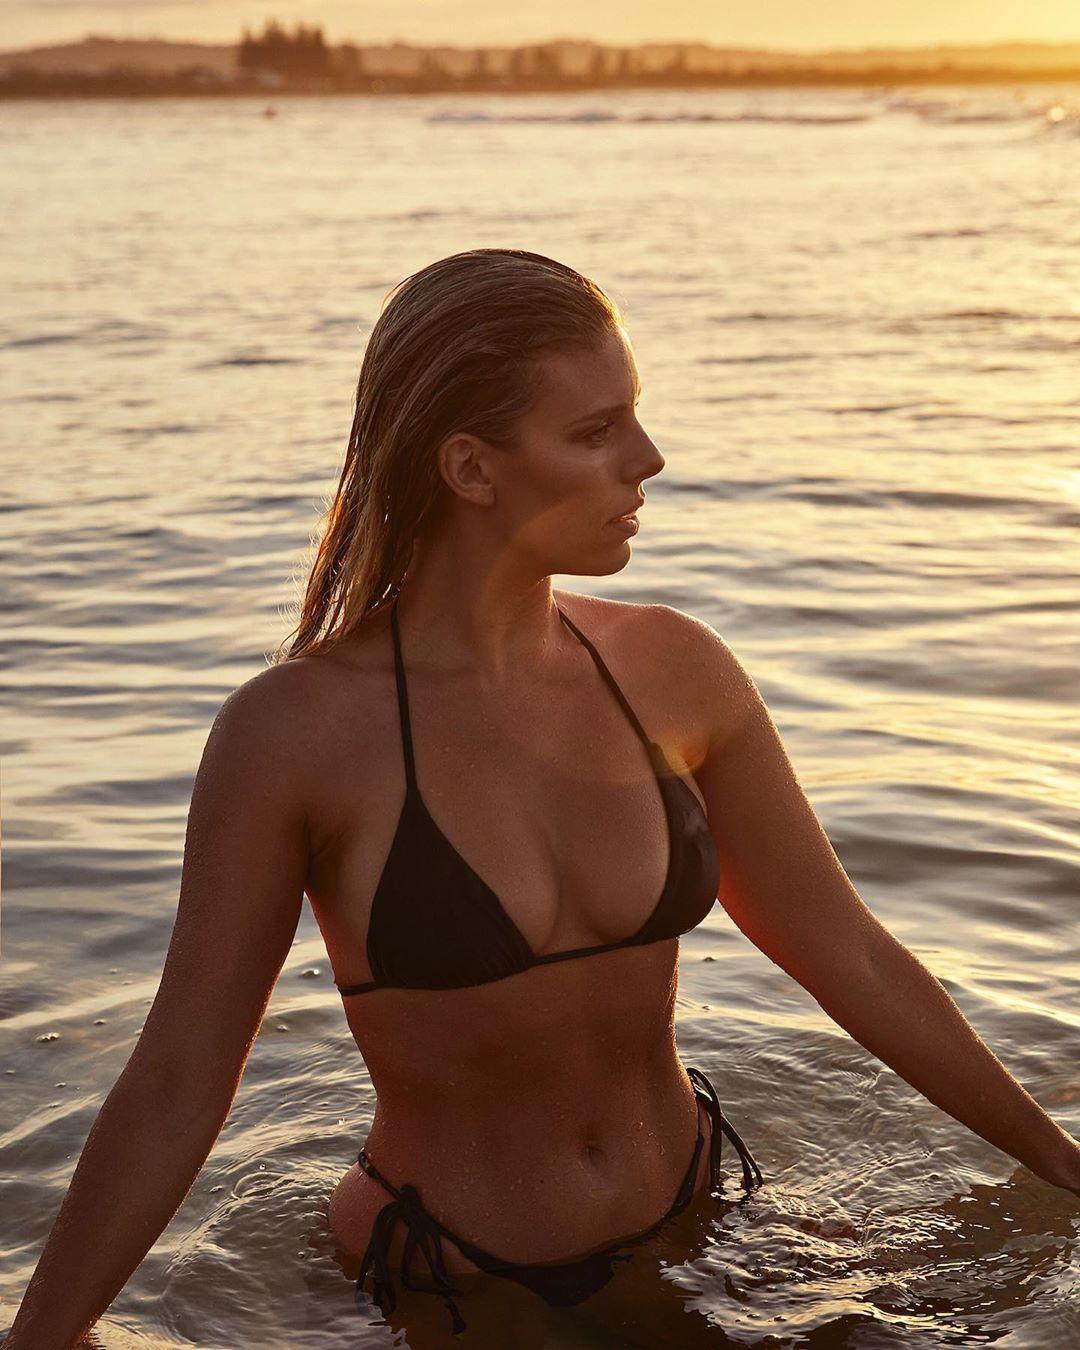 Natasha Oakley wearing a Plunging black Monday Swimwear bikini top with spaghetti straps